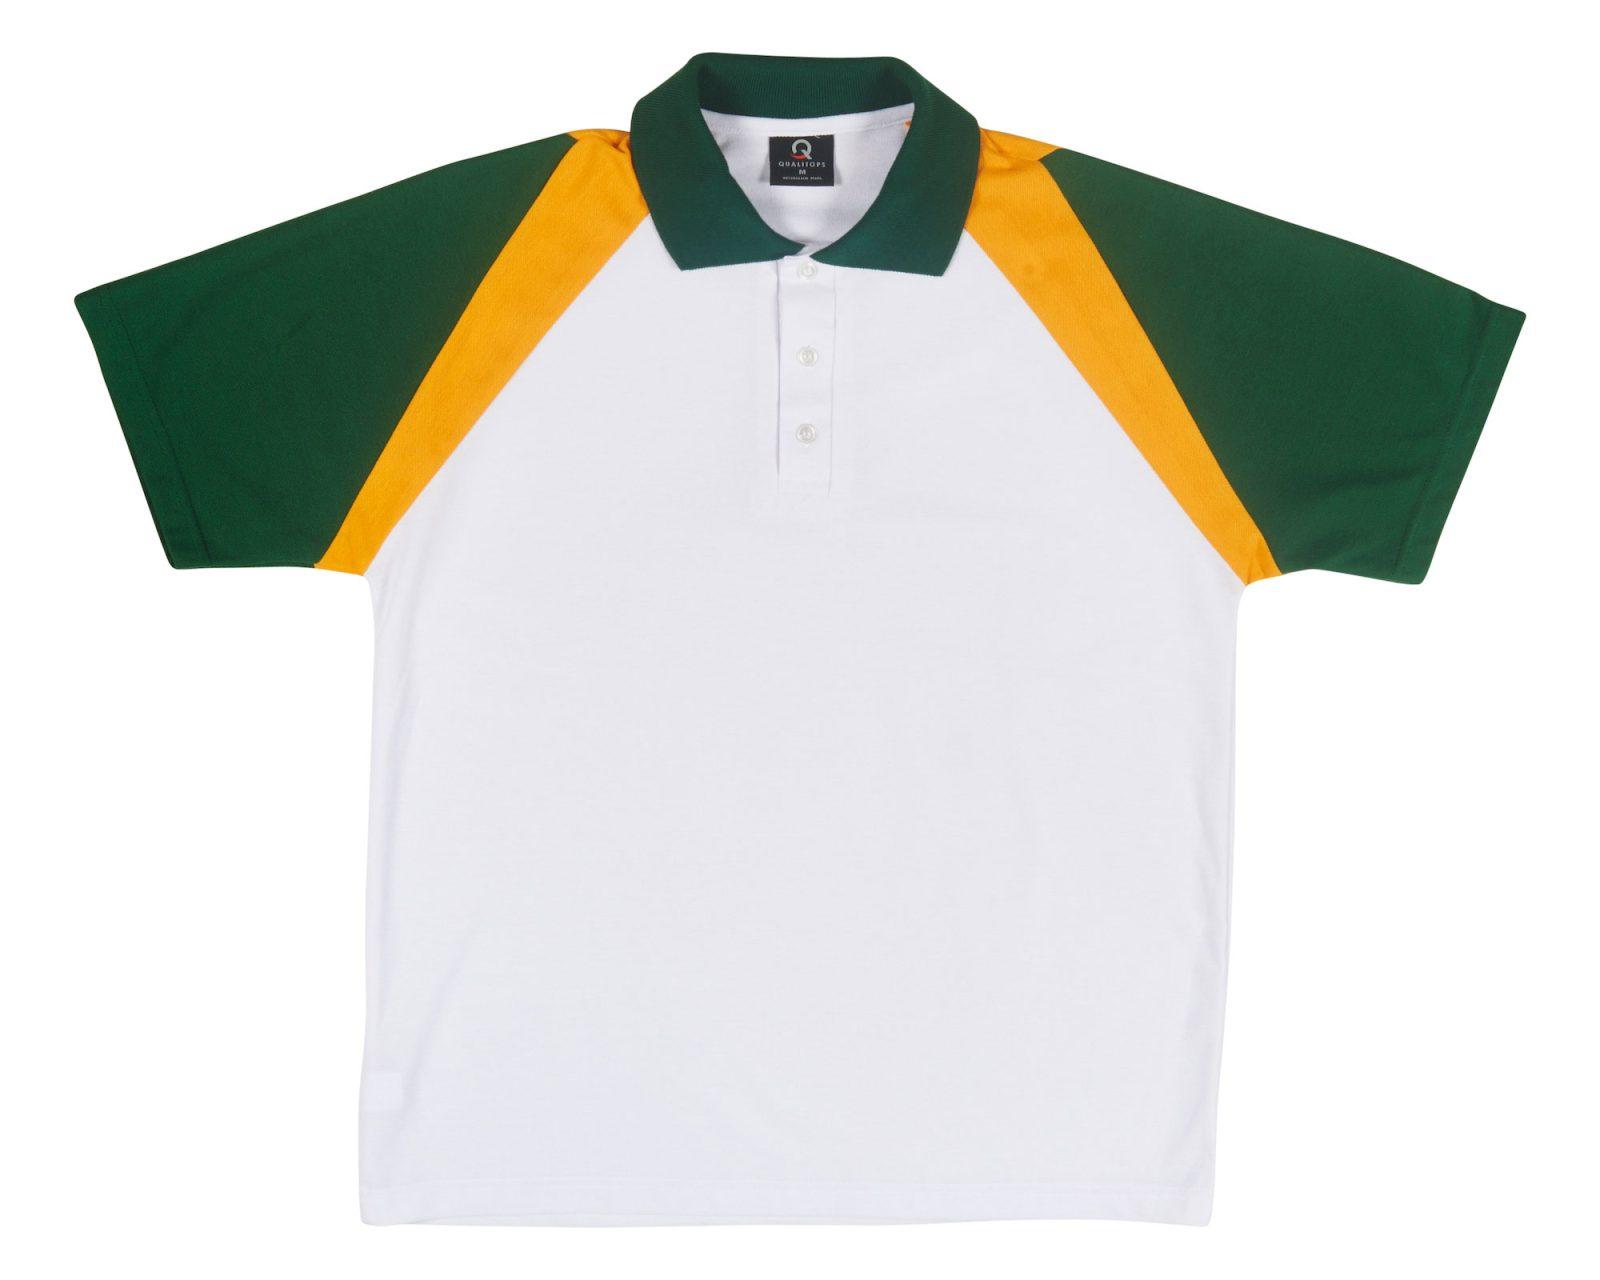 Mens Two Tone Ss Polo 408 Australian Made Polo Shirt Qualitops